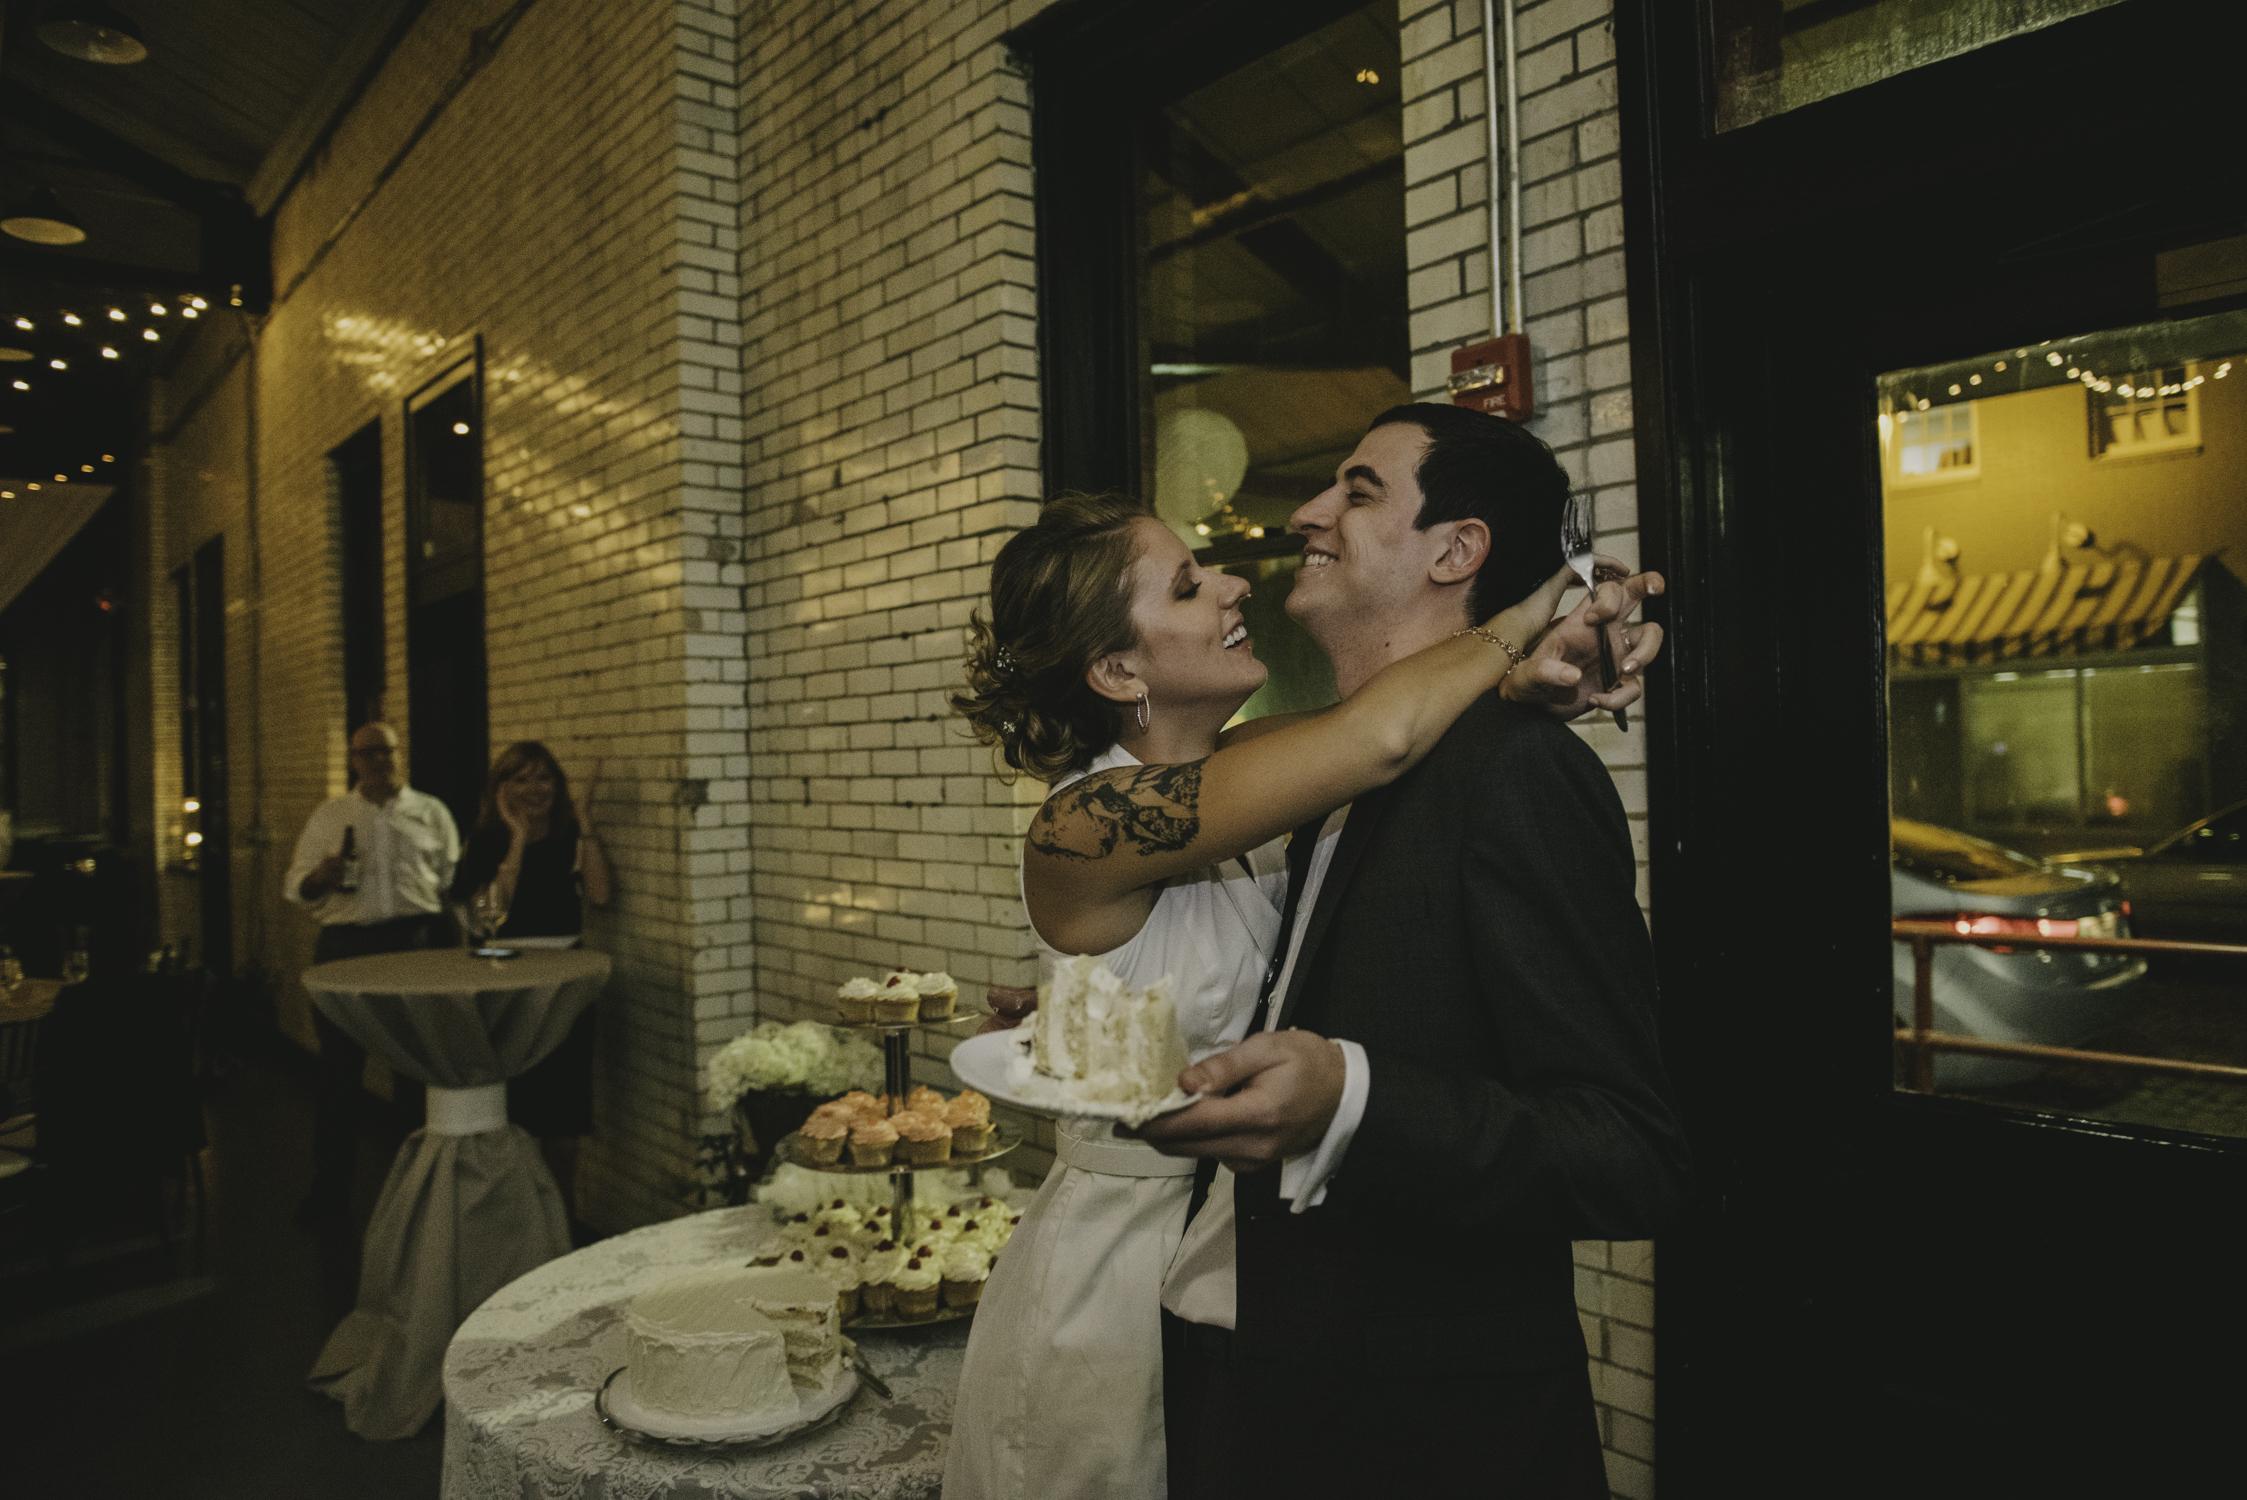 wedding cake smash at 214 martin raleigh nc